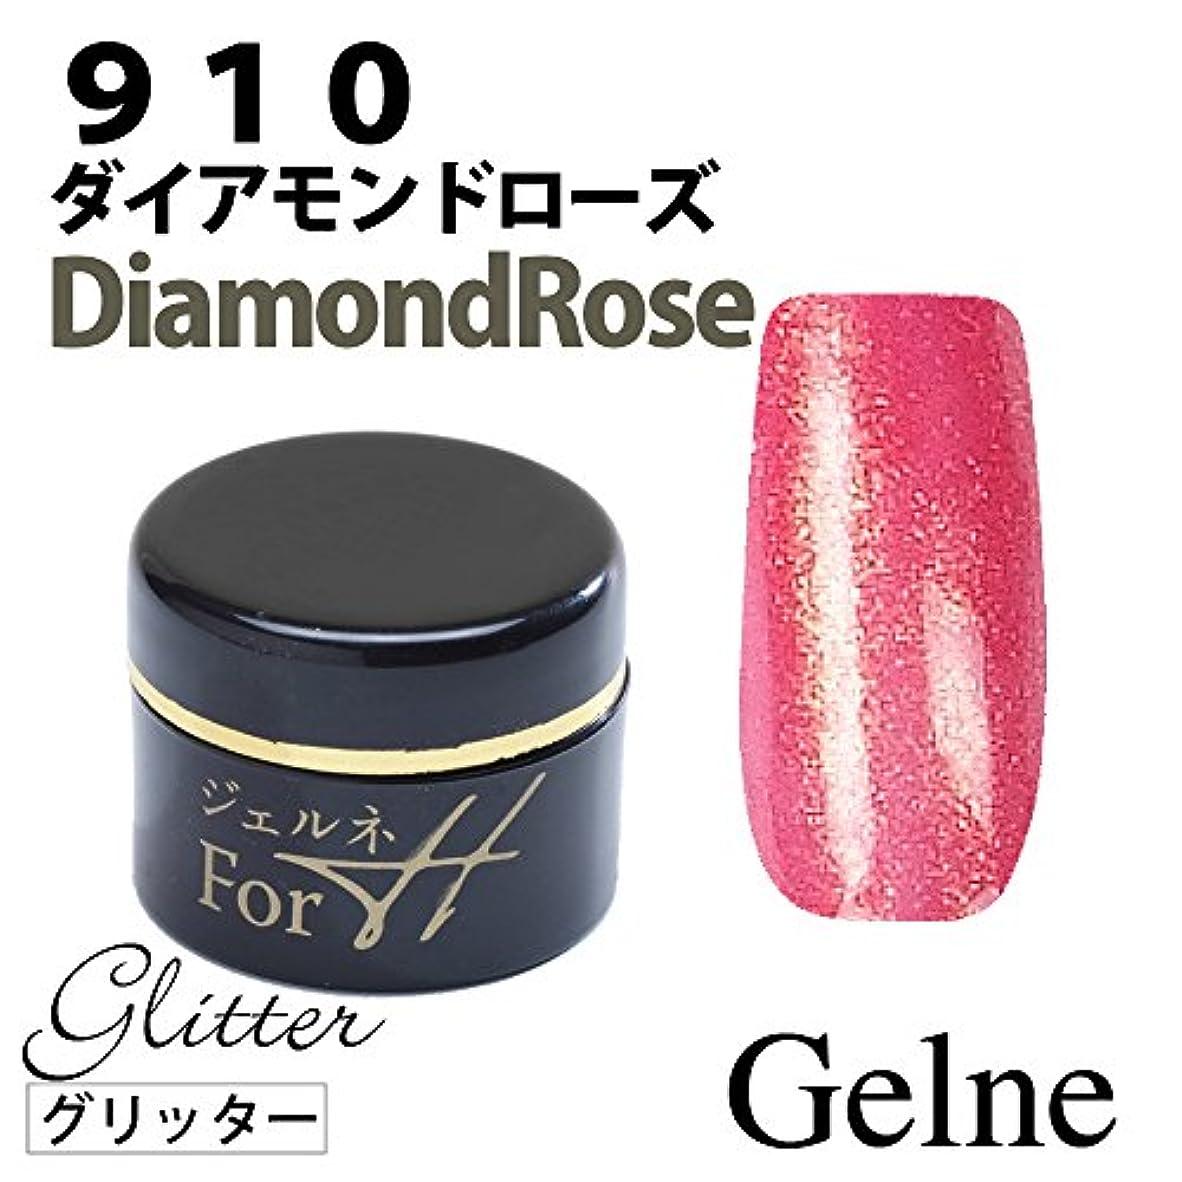 Gelneオリジナル ダイヤモンドローズ カラージェル 5g LED/UV対応 ソークオフジェル